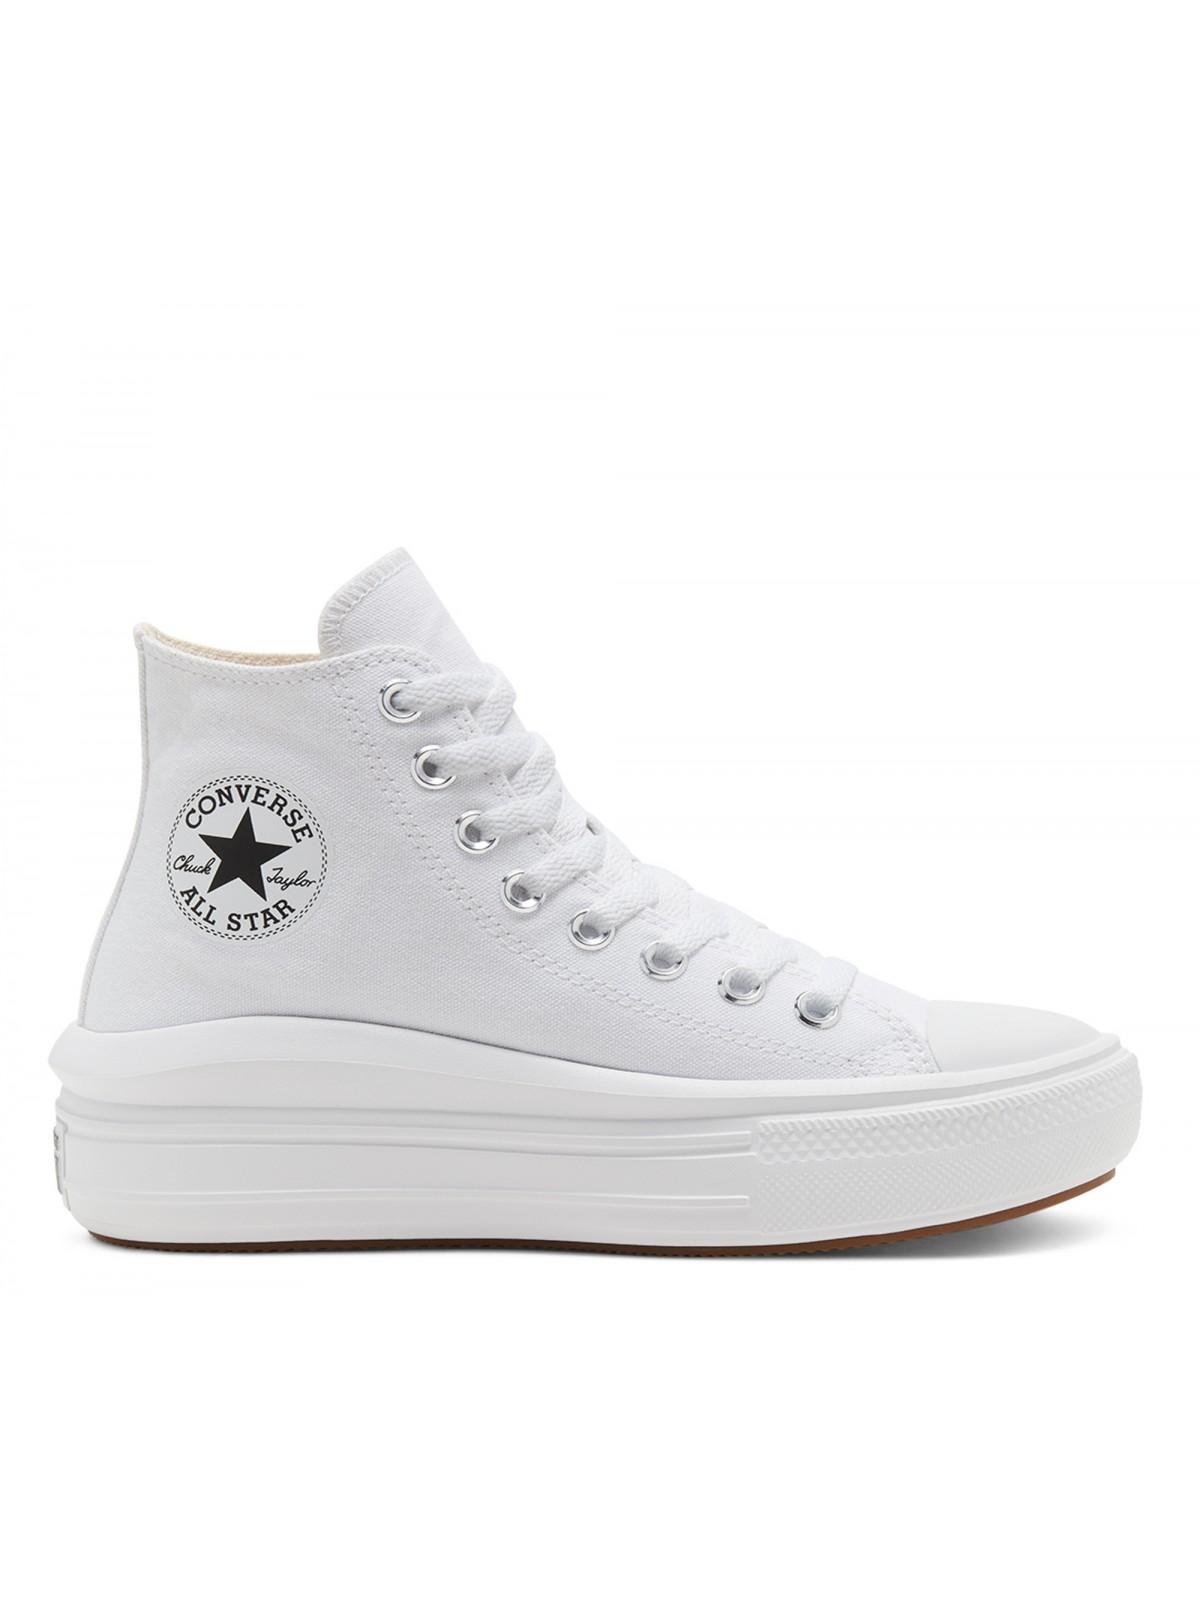 Converse Chuck Taylor all star Move blanc ( plateforme)